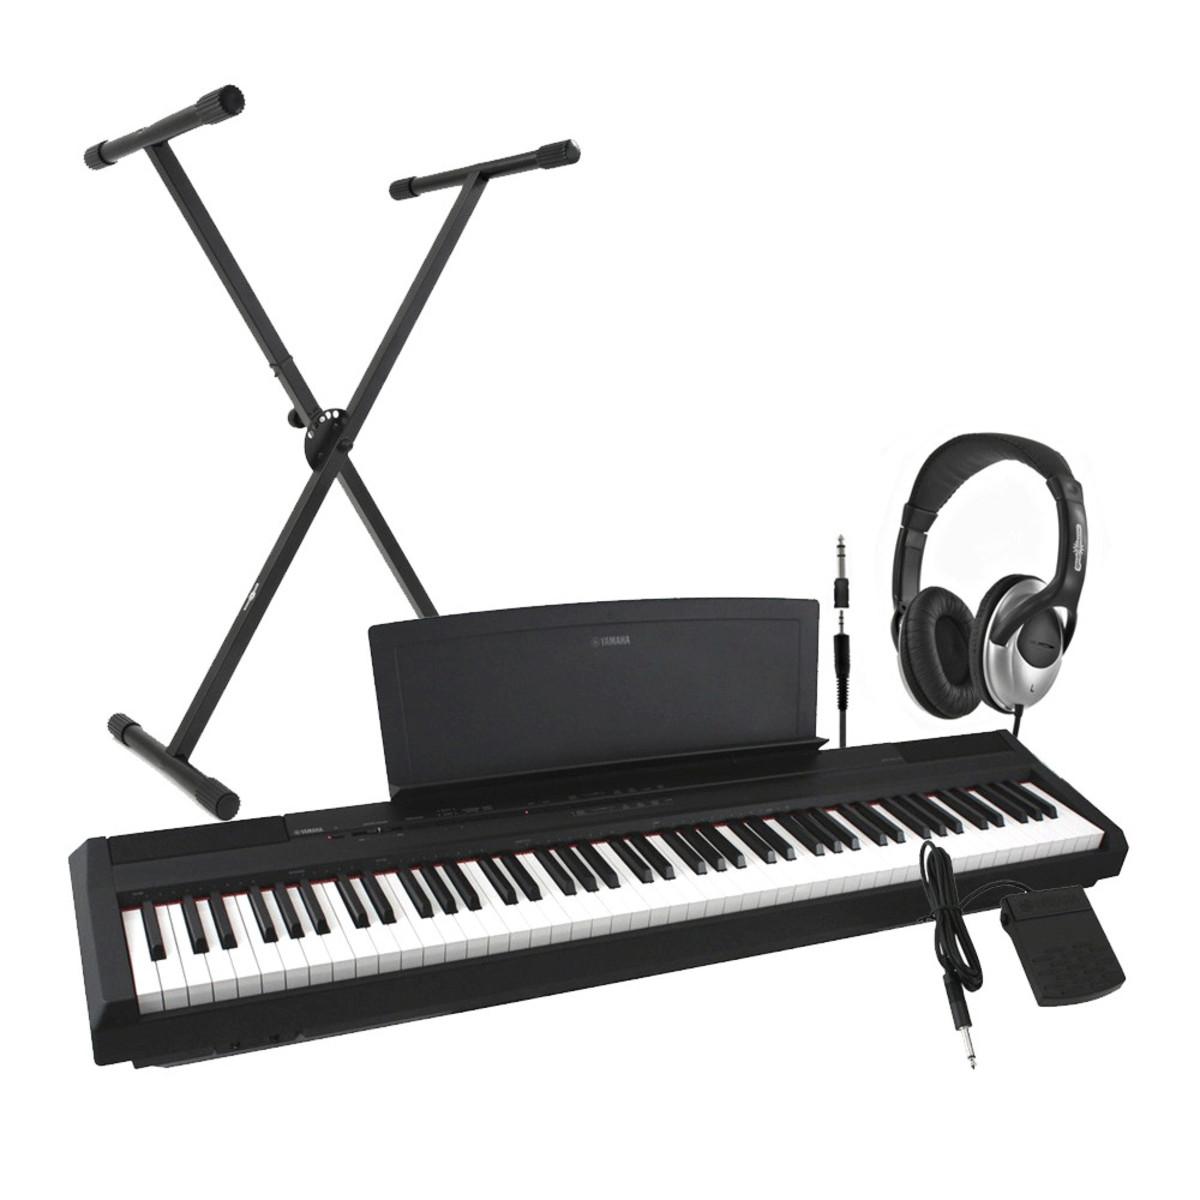 disc yamaha p35 digital piano black including stand and headphones hos. Black Bedroom Furniture Sets. Home Design Ideas